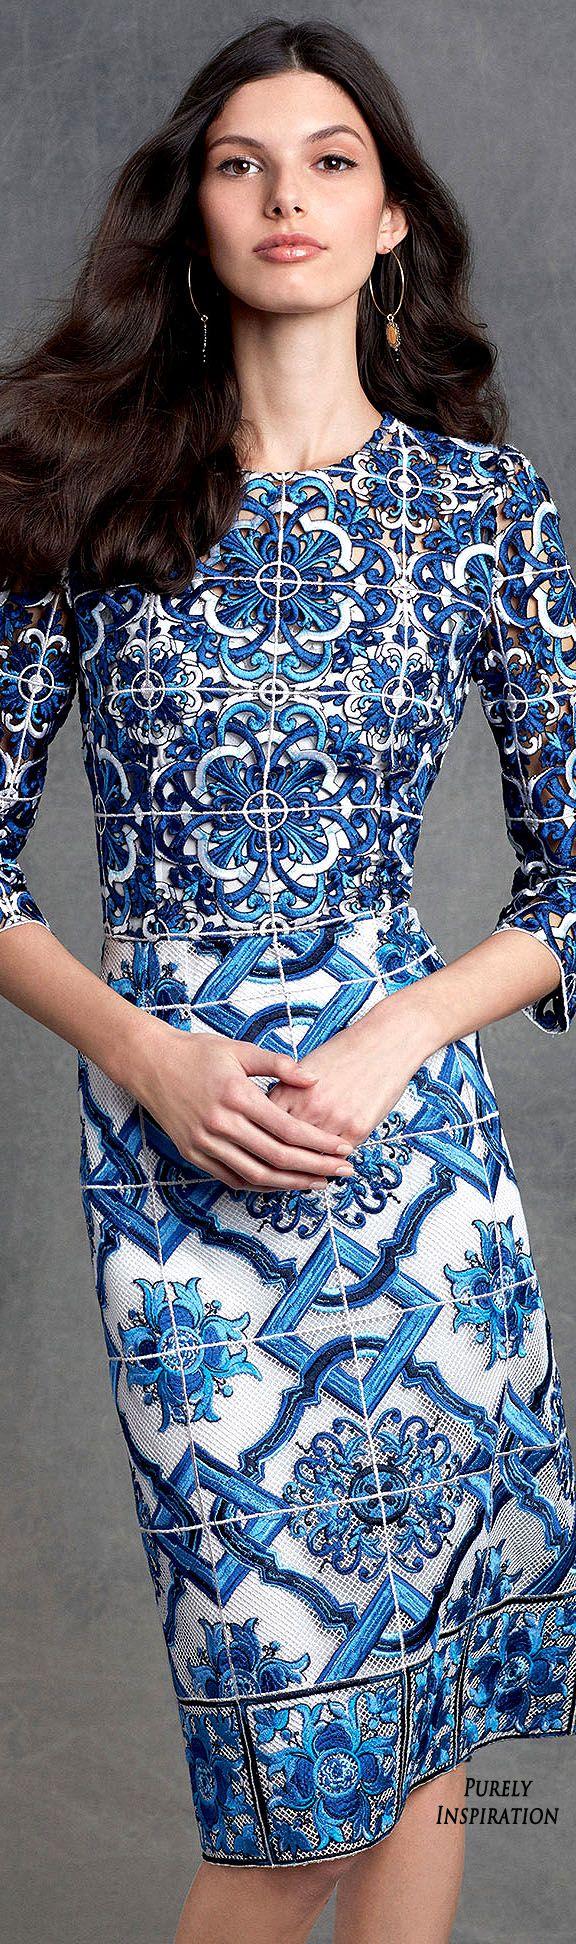 Dolce&Gabbana Winter Collection Women's Fashion RTW | Purely Inspiration